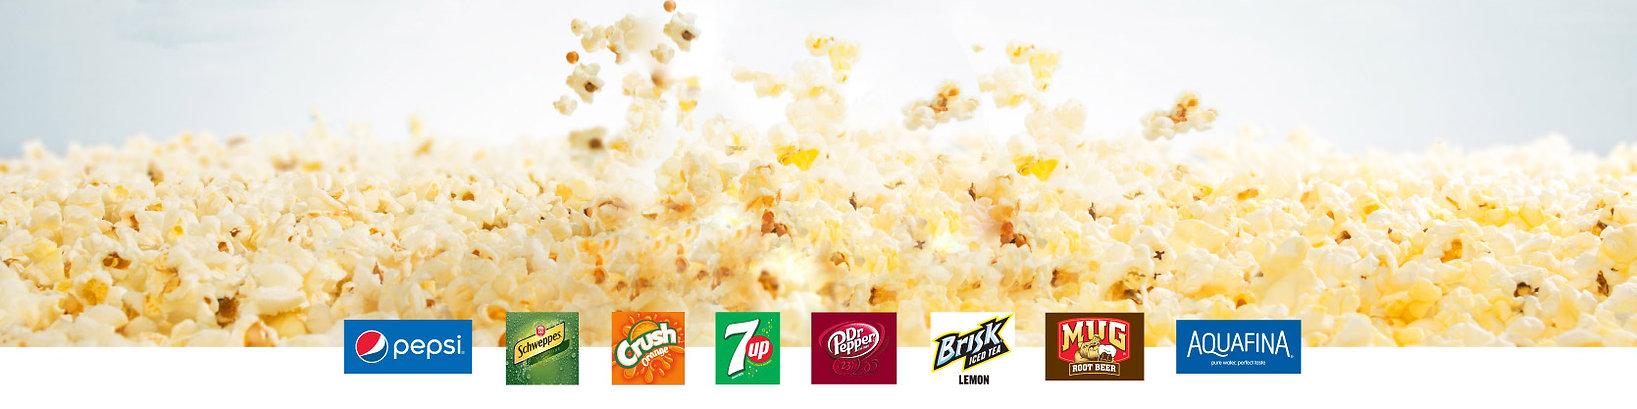 Popcorn_Movies_RoxyTheatre.jpg